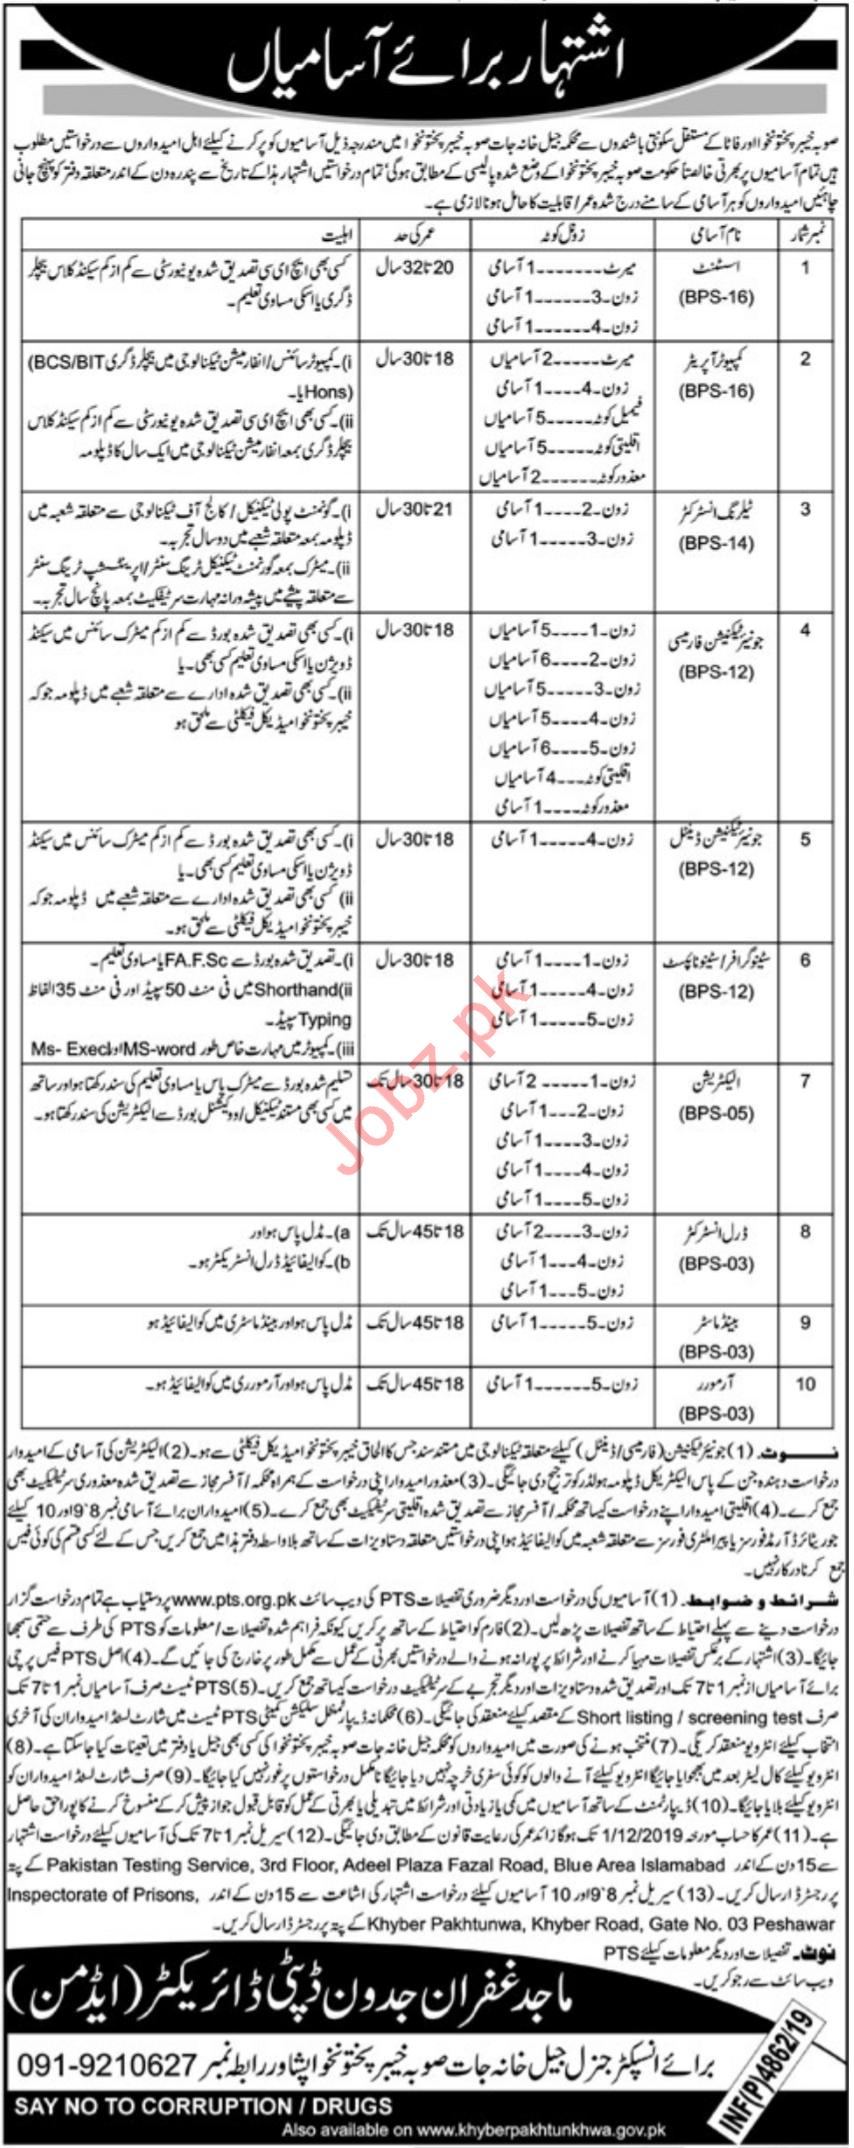 KPK Prison Department Jobs 2019 in Peshawar via PTS